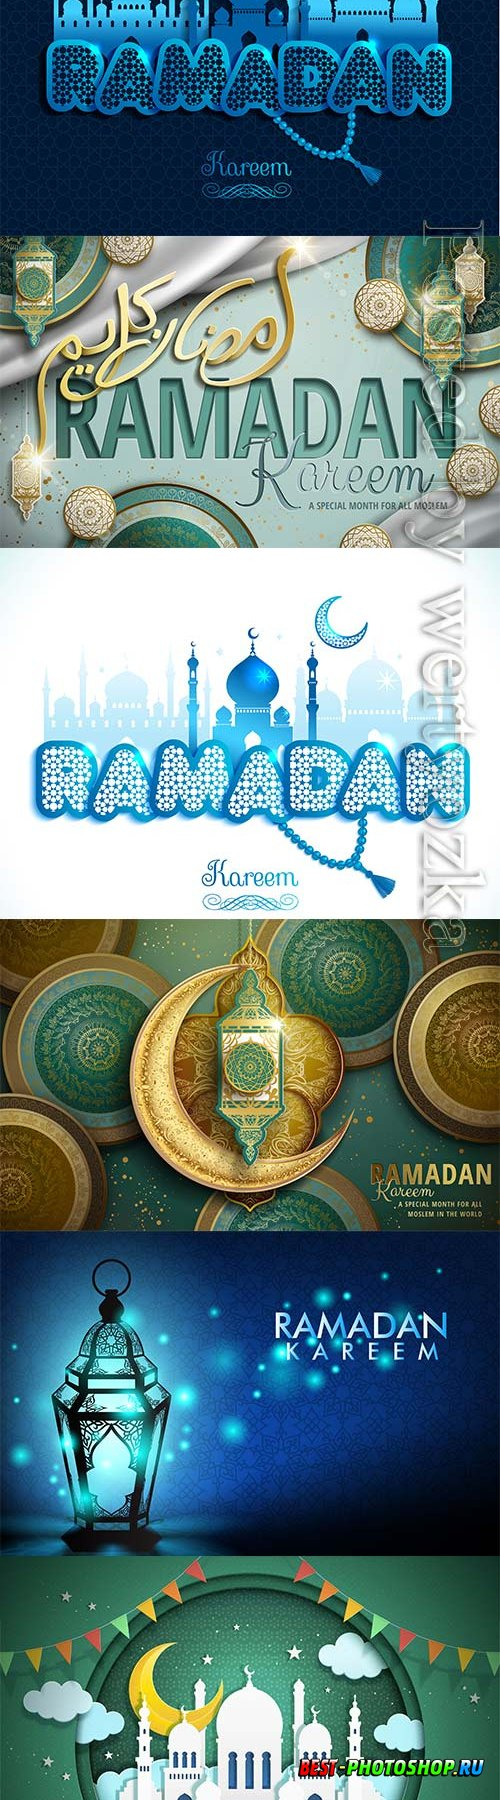 Ramadan kareem colorr vector illustration